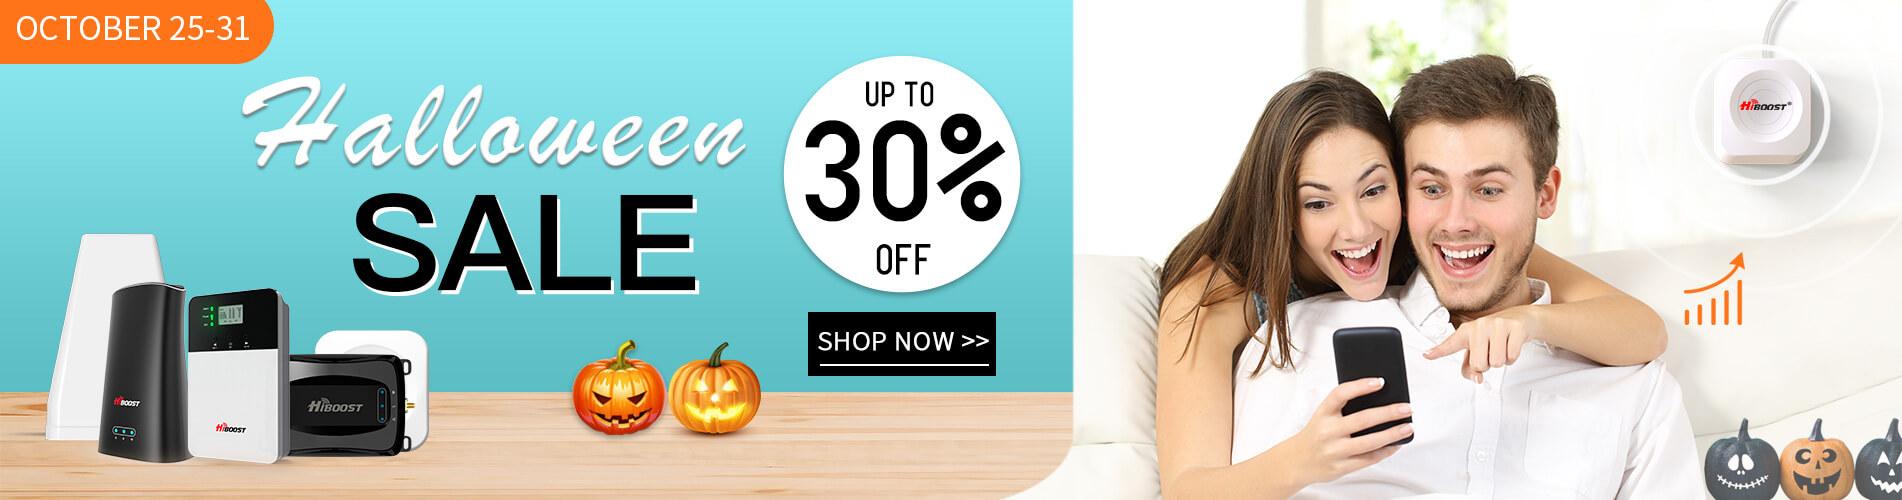 Hiboost-Halloween-Sale-Banner (2)